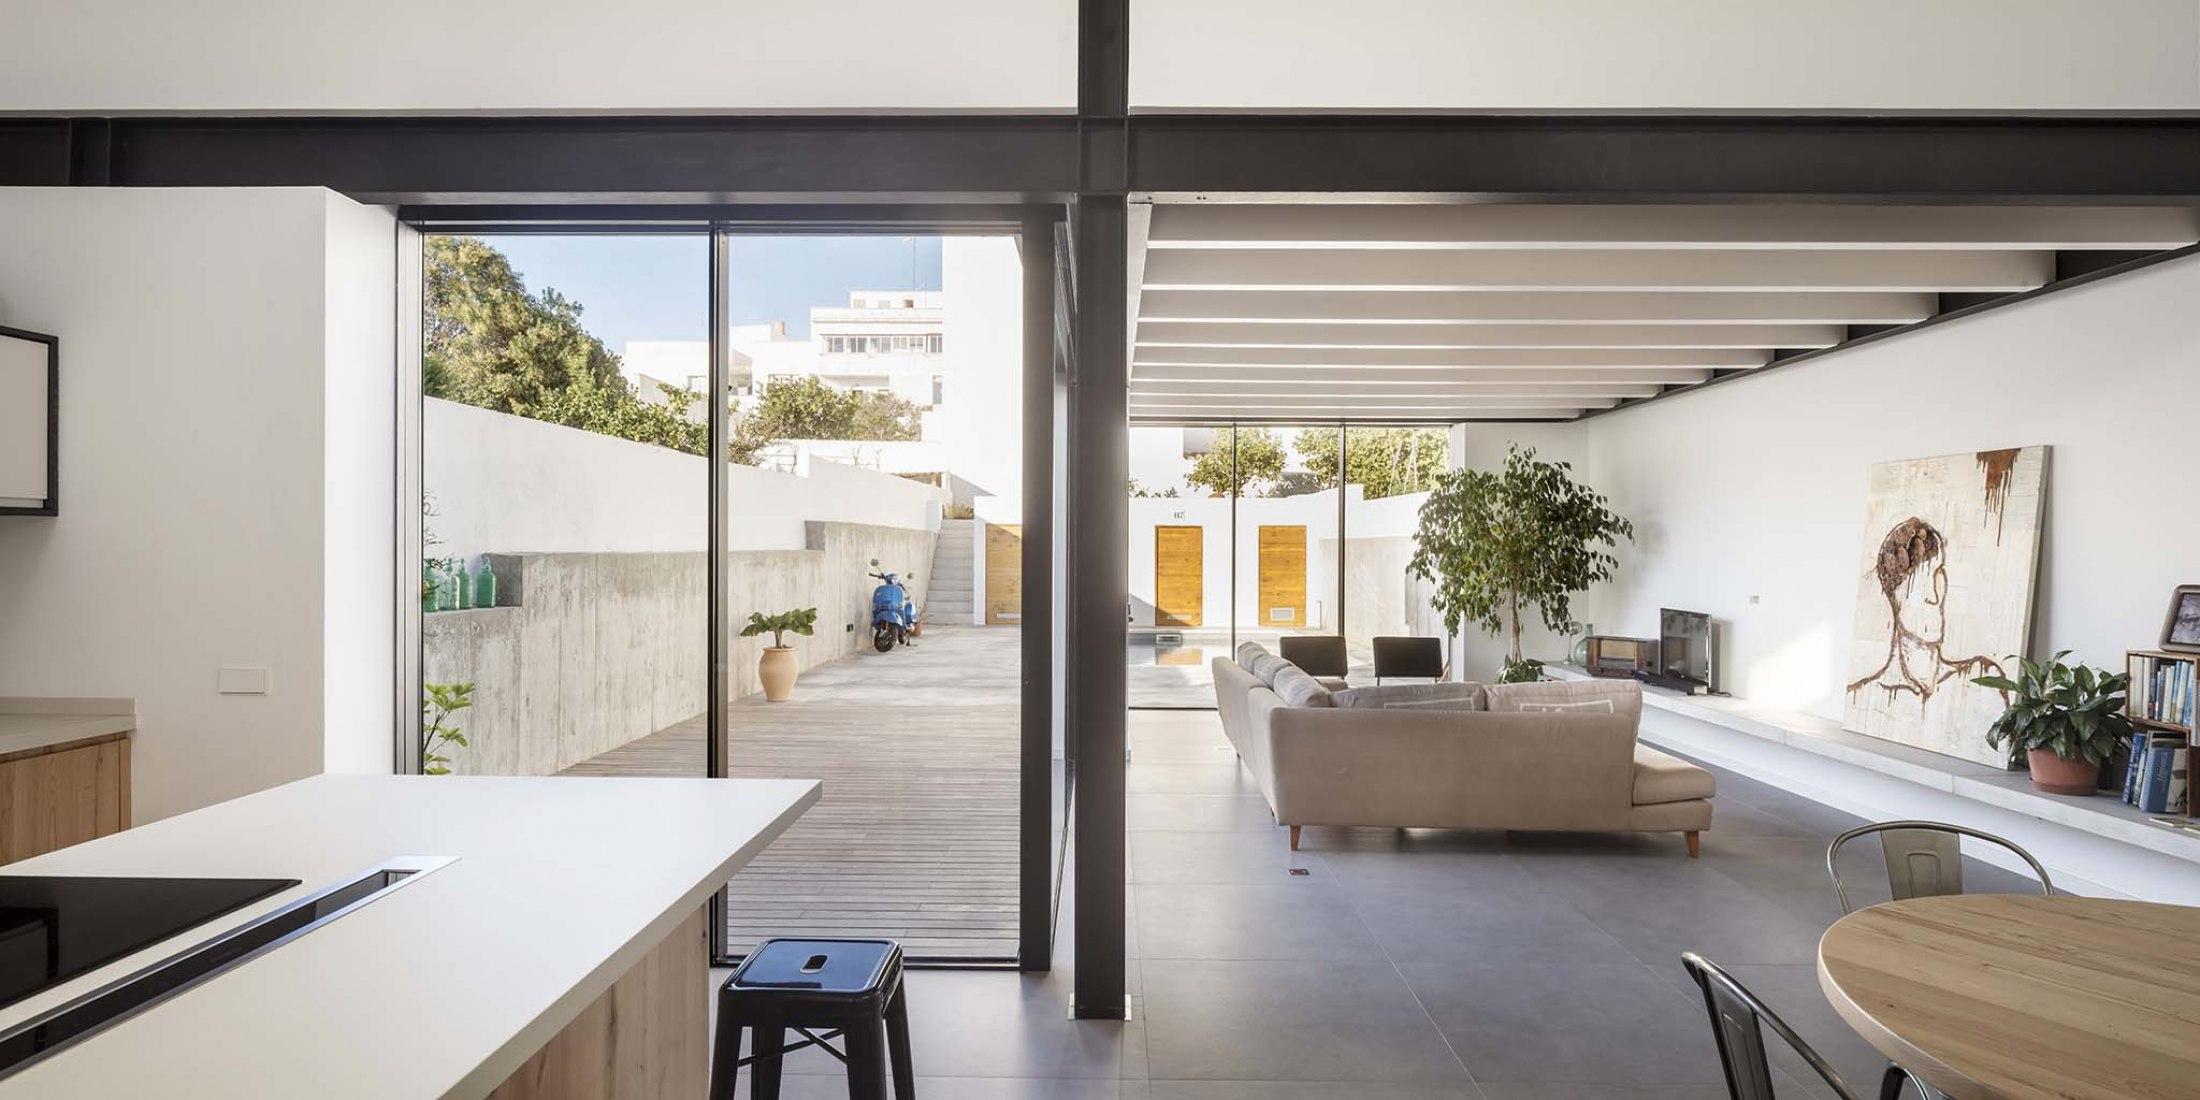 Casa L+C por Gabriel Montañés. Fotografía por Adrià Goula